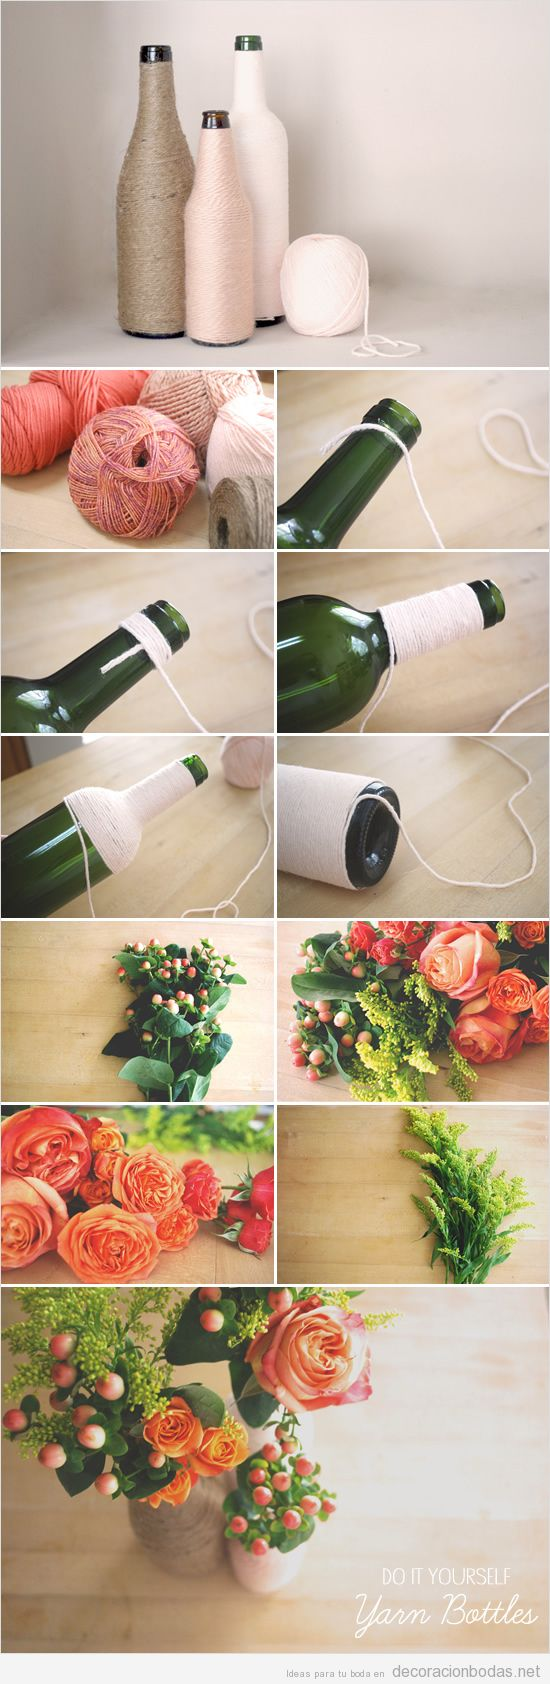 Botellas decorada con cuerda de yute o cáñamo, decoración mesa